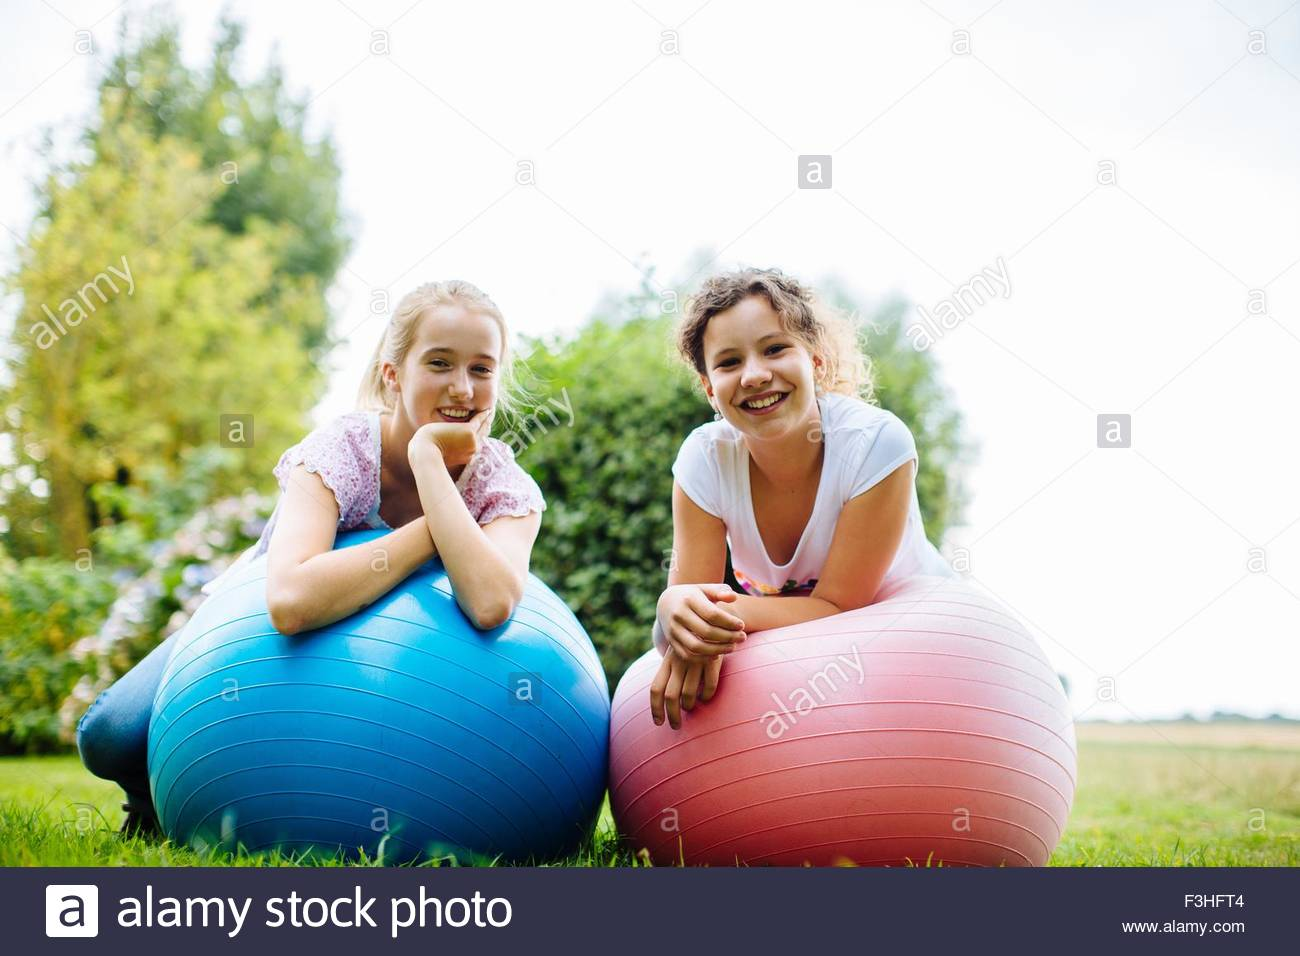 Portrait of two tween girls on exercise balls in garden - Stock Image